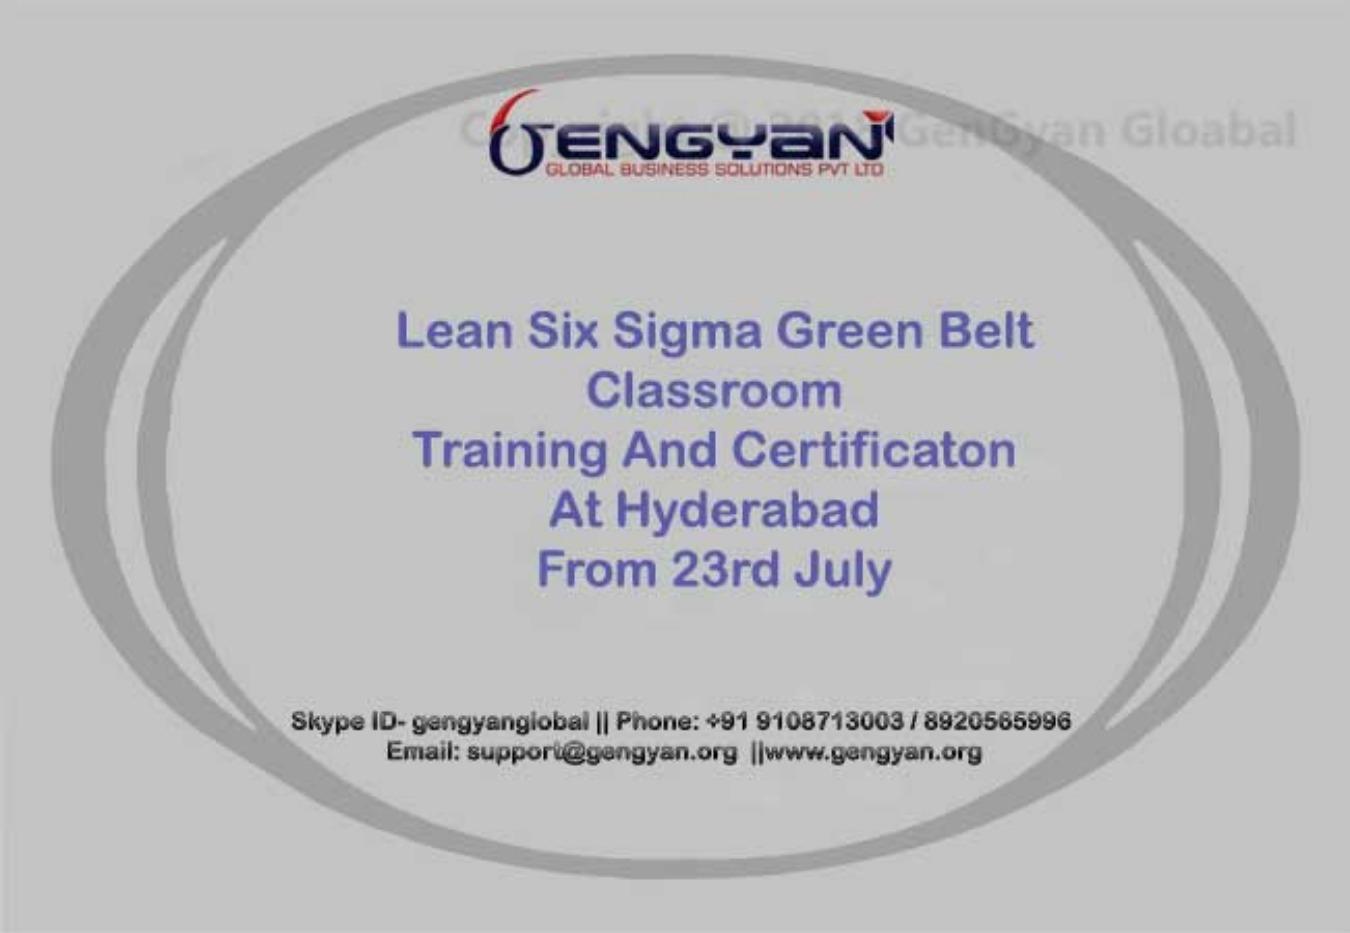 Lean Six Sigma Green Belt Classroom Training Hyderabad Tickets By